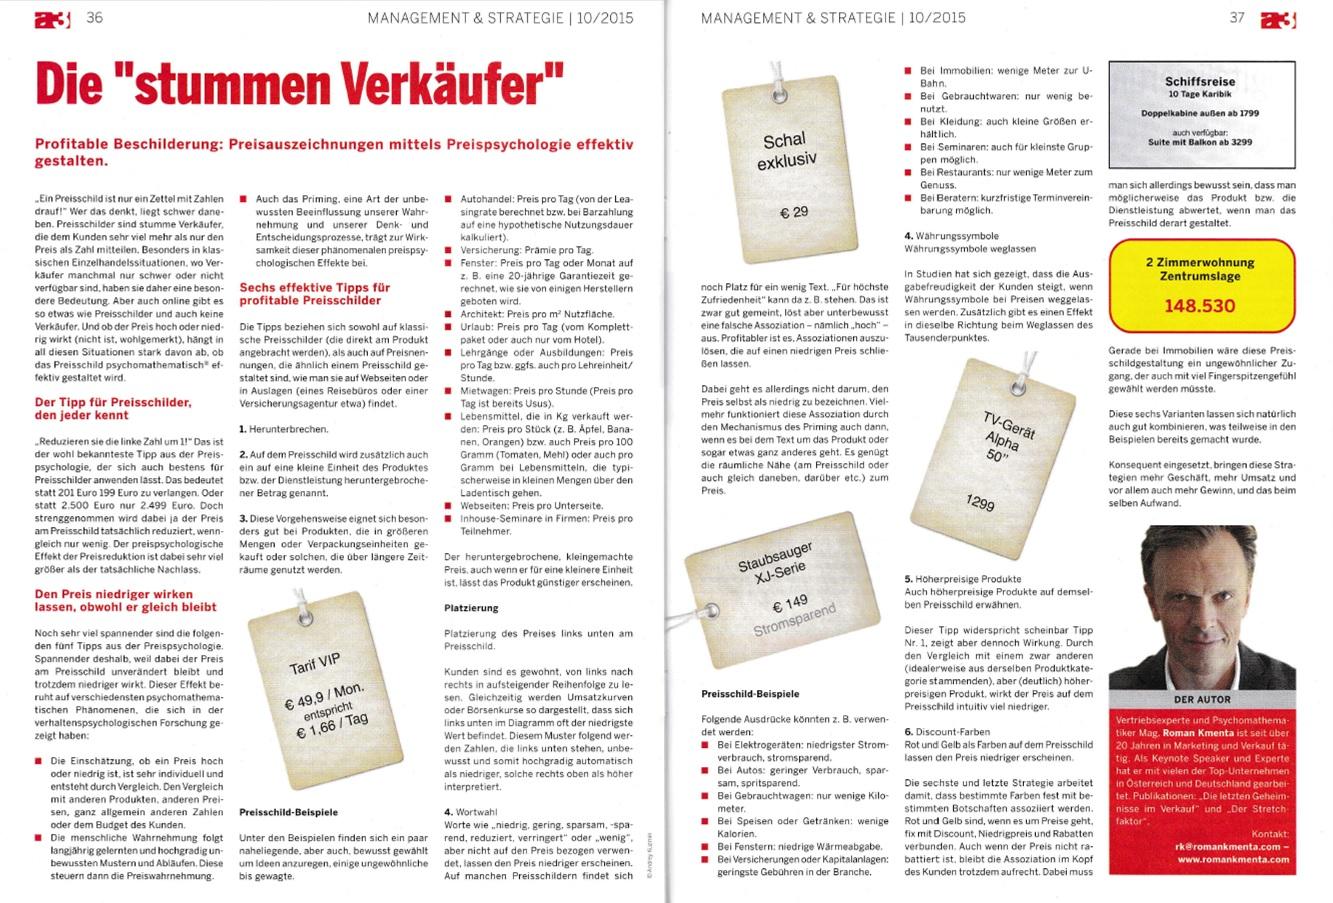 Preischilder - Roman Kmenta - a3 ECO 10/2015